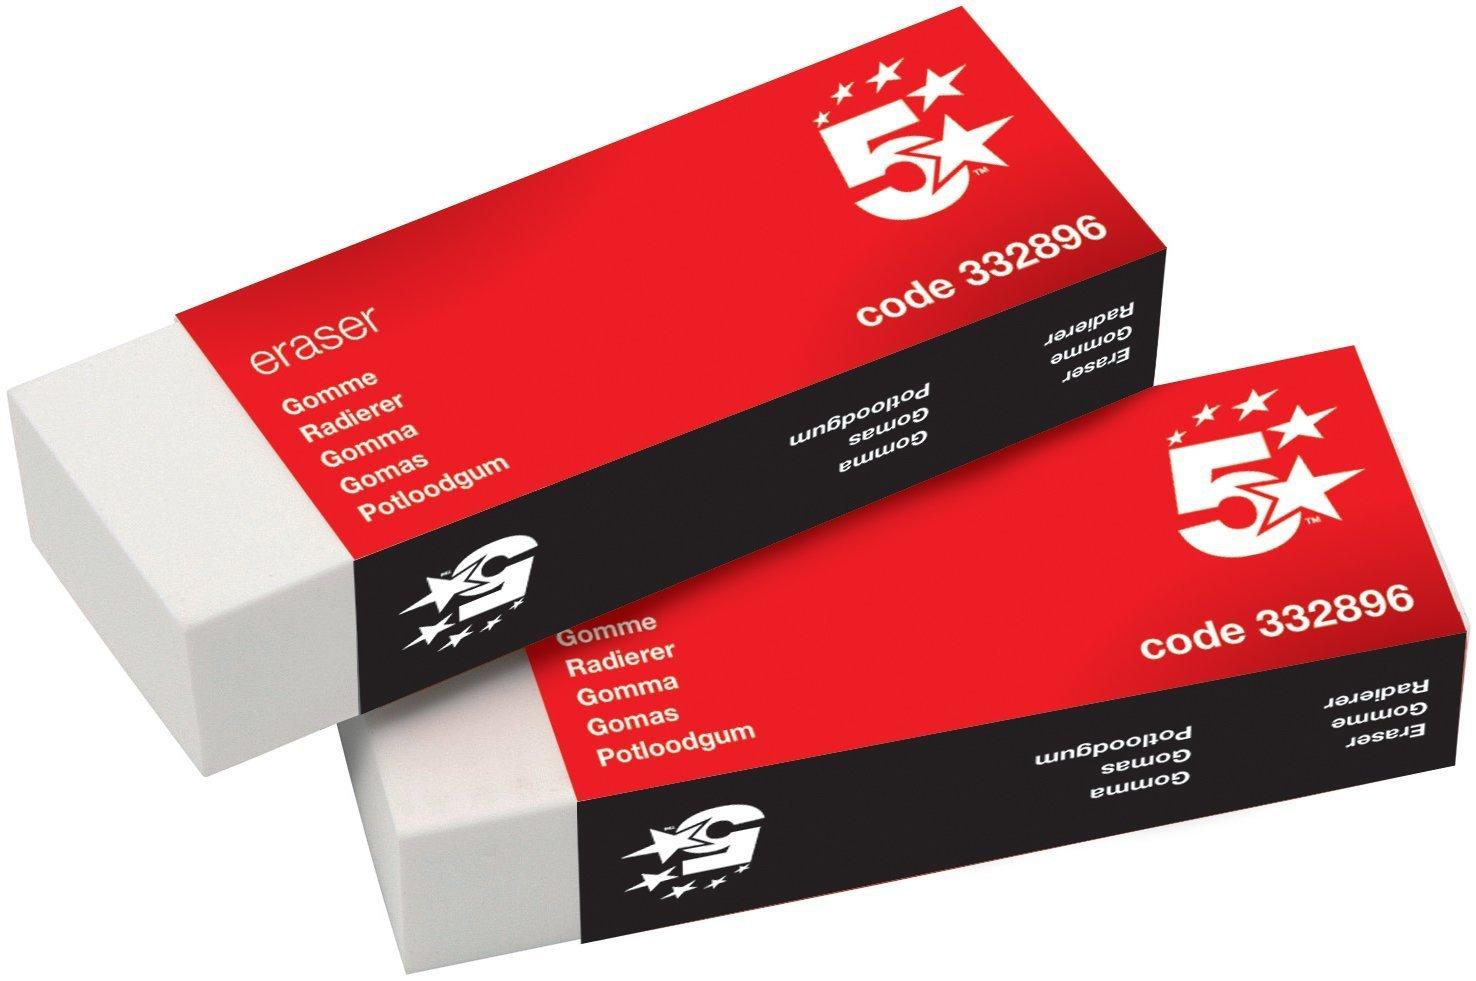 5 Star Office Plastic Eraser Paper-sleeved 60x21x12mm [Pack 10] Spicers Ltd 332896